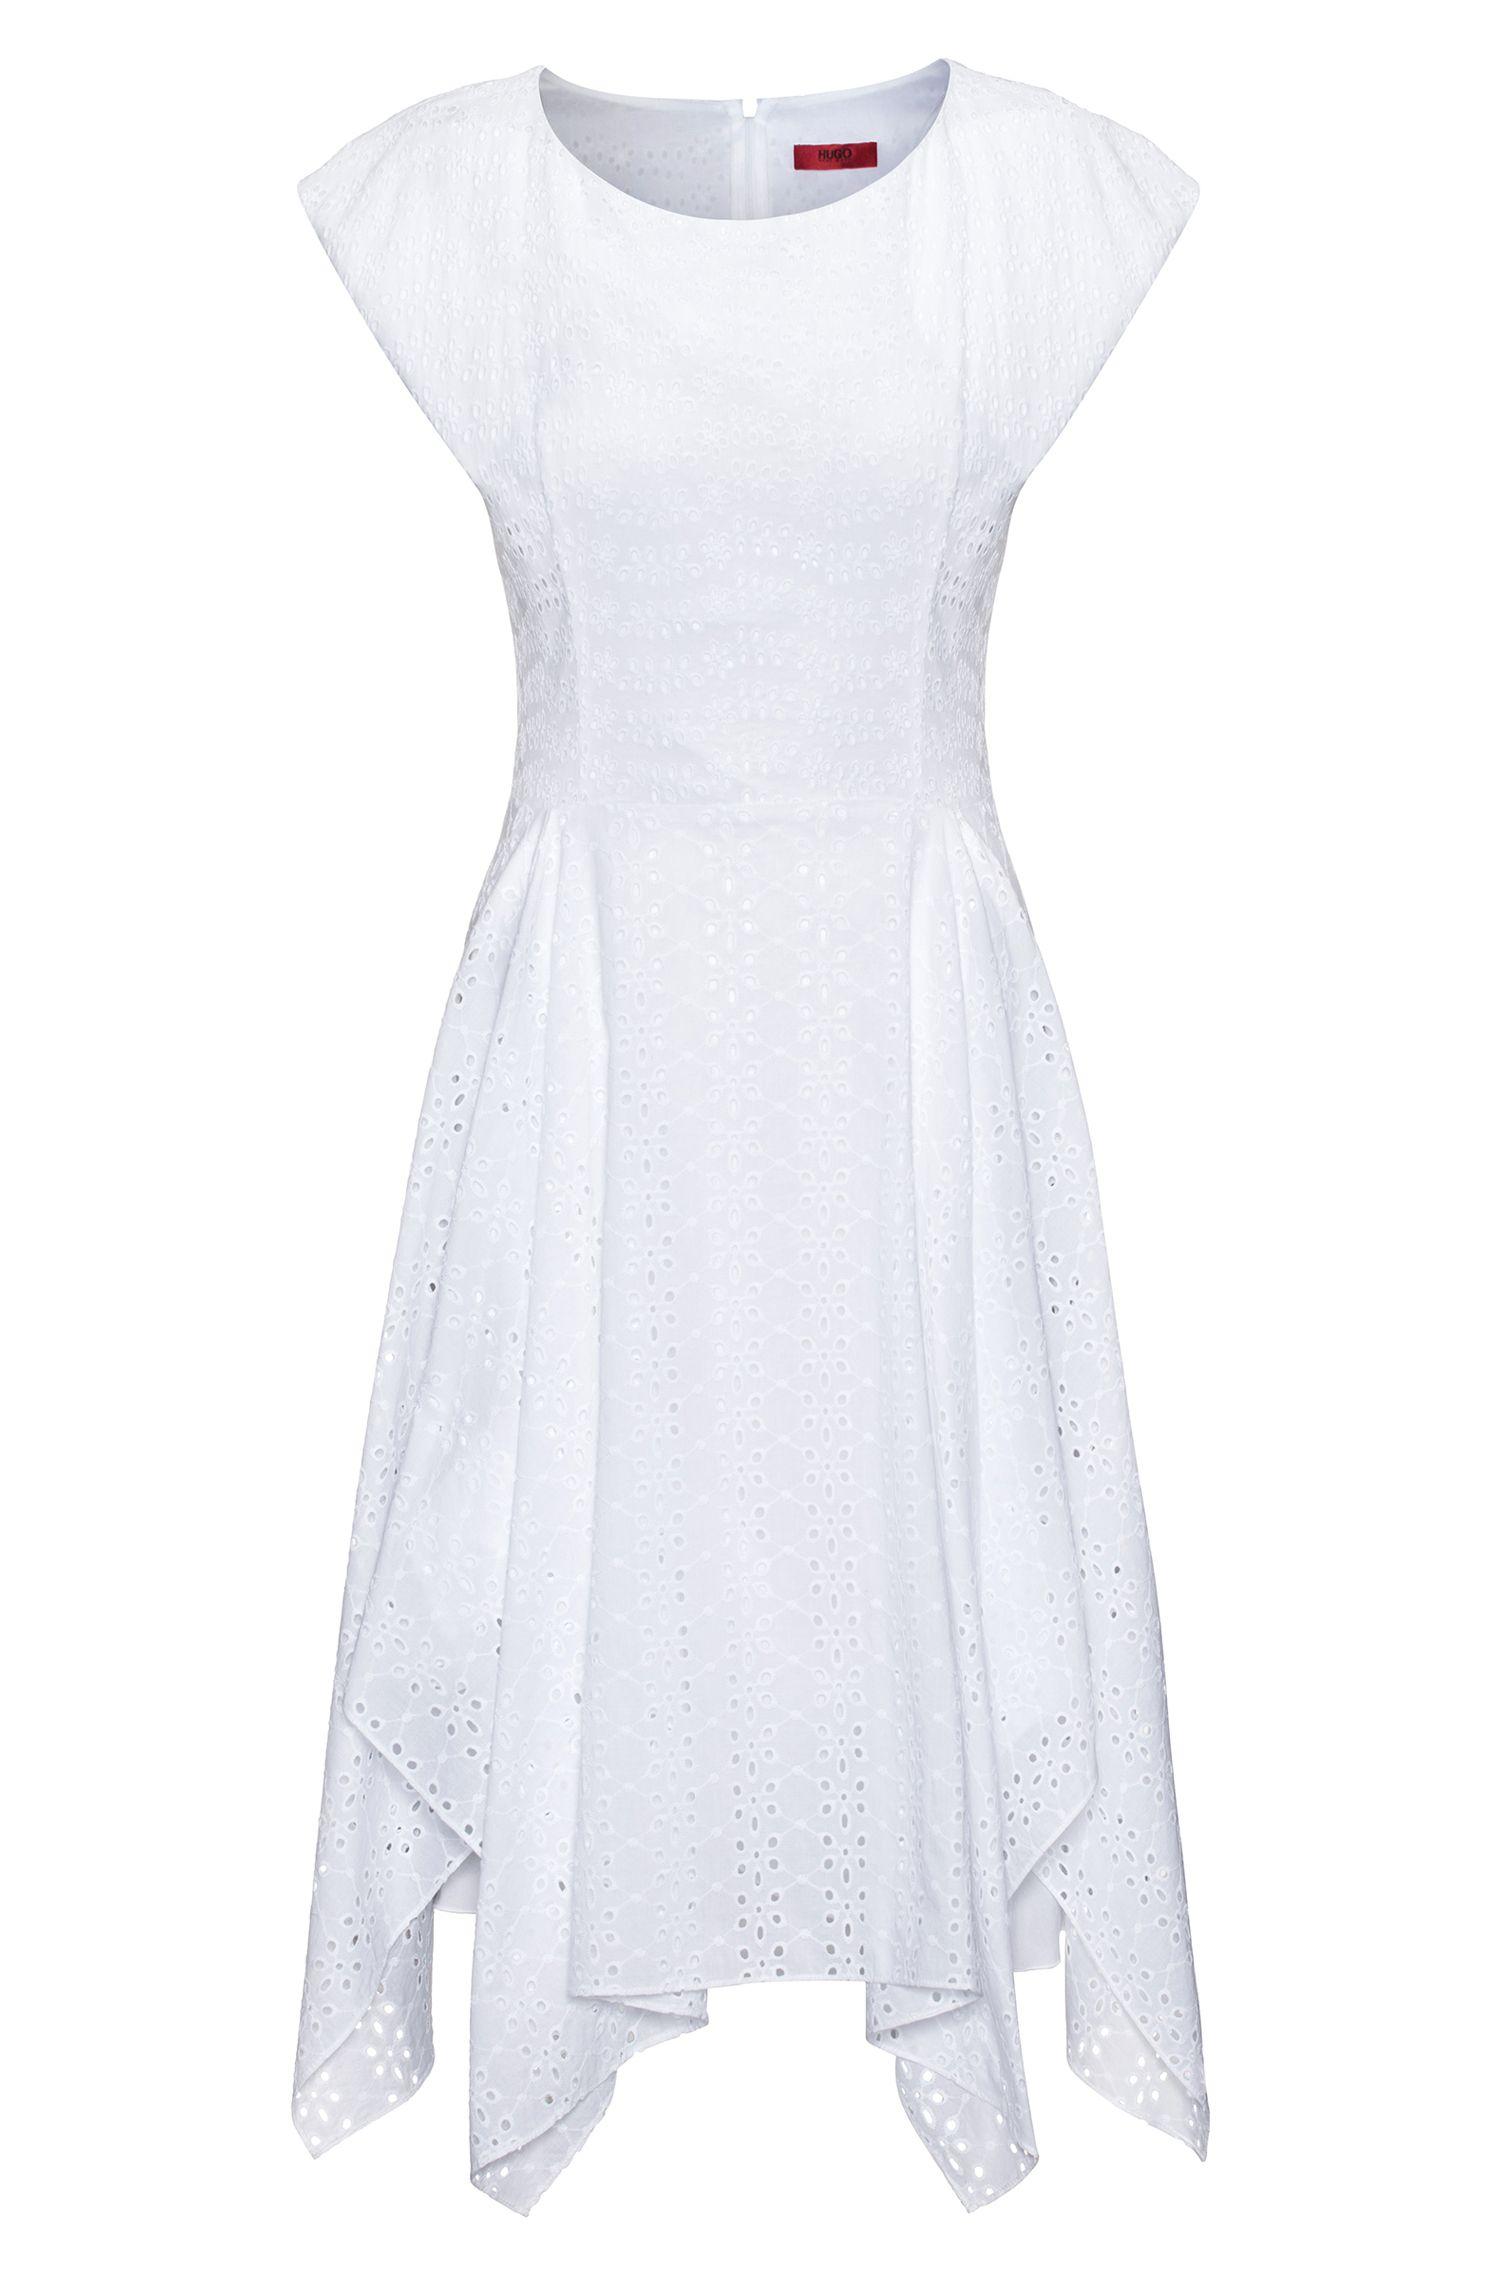 Robe «mouchoir» en coton à broderie anglaise